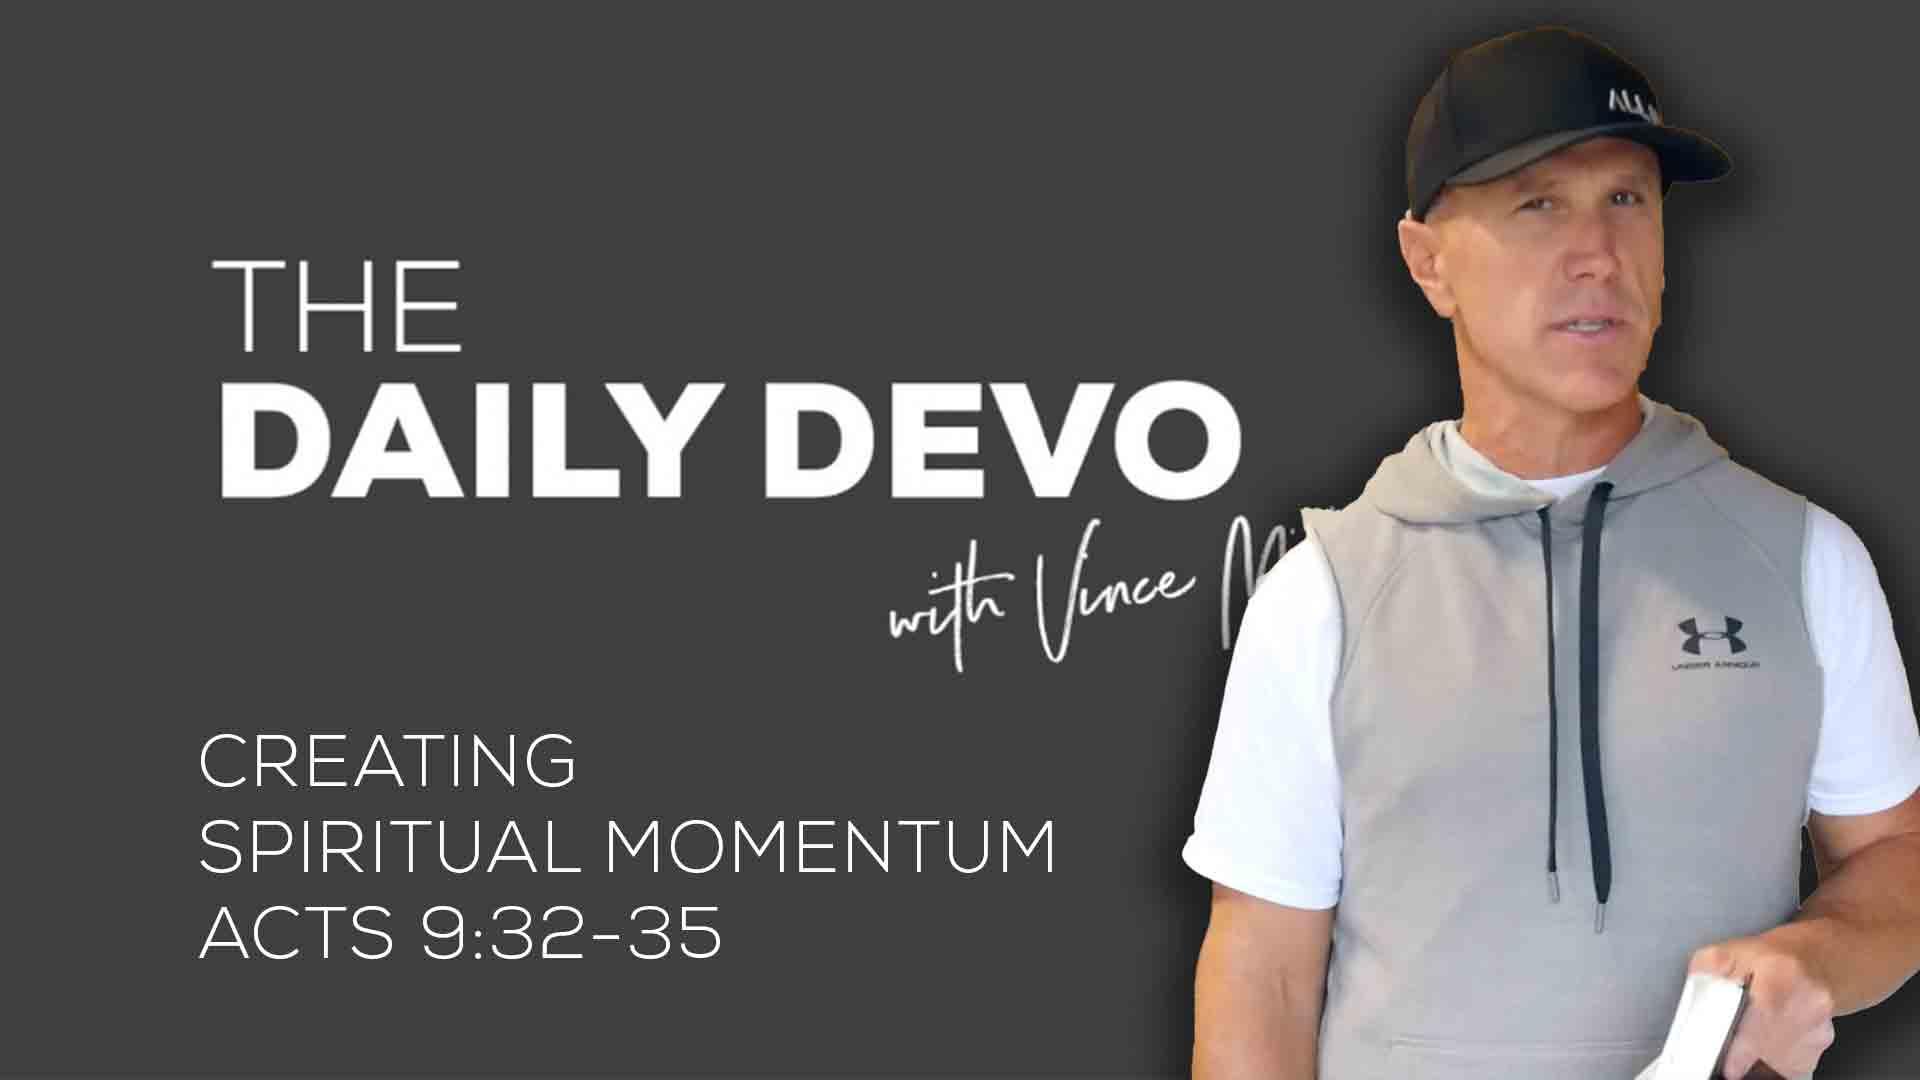 Creating Spiritual Momentum